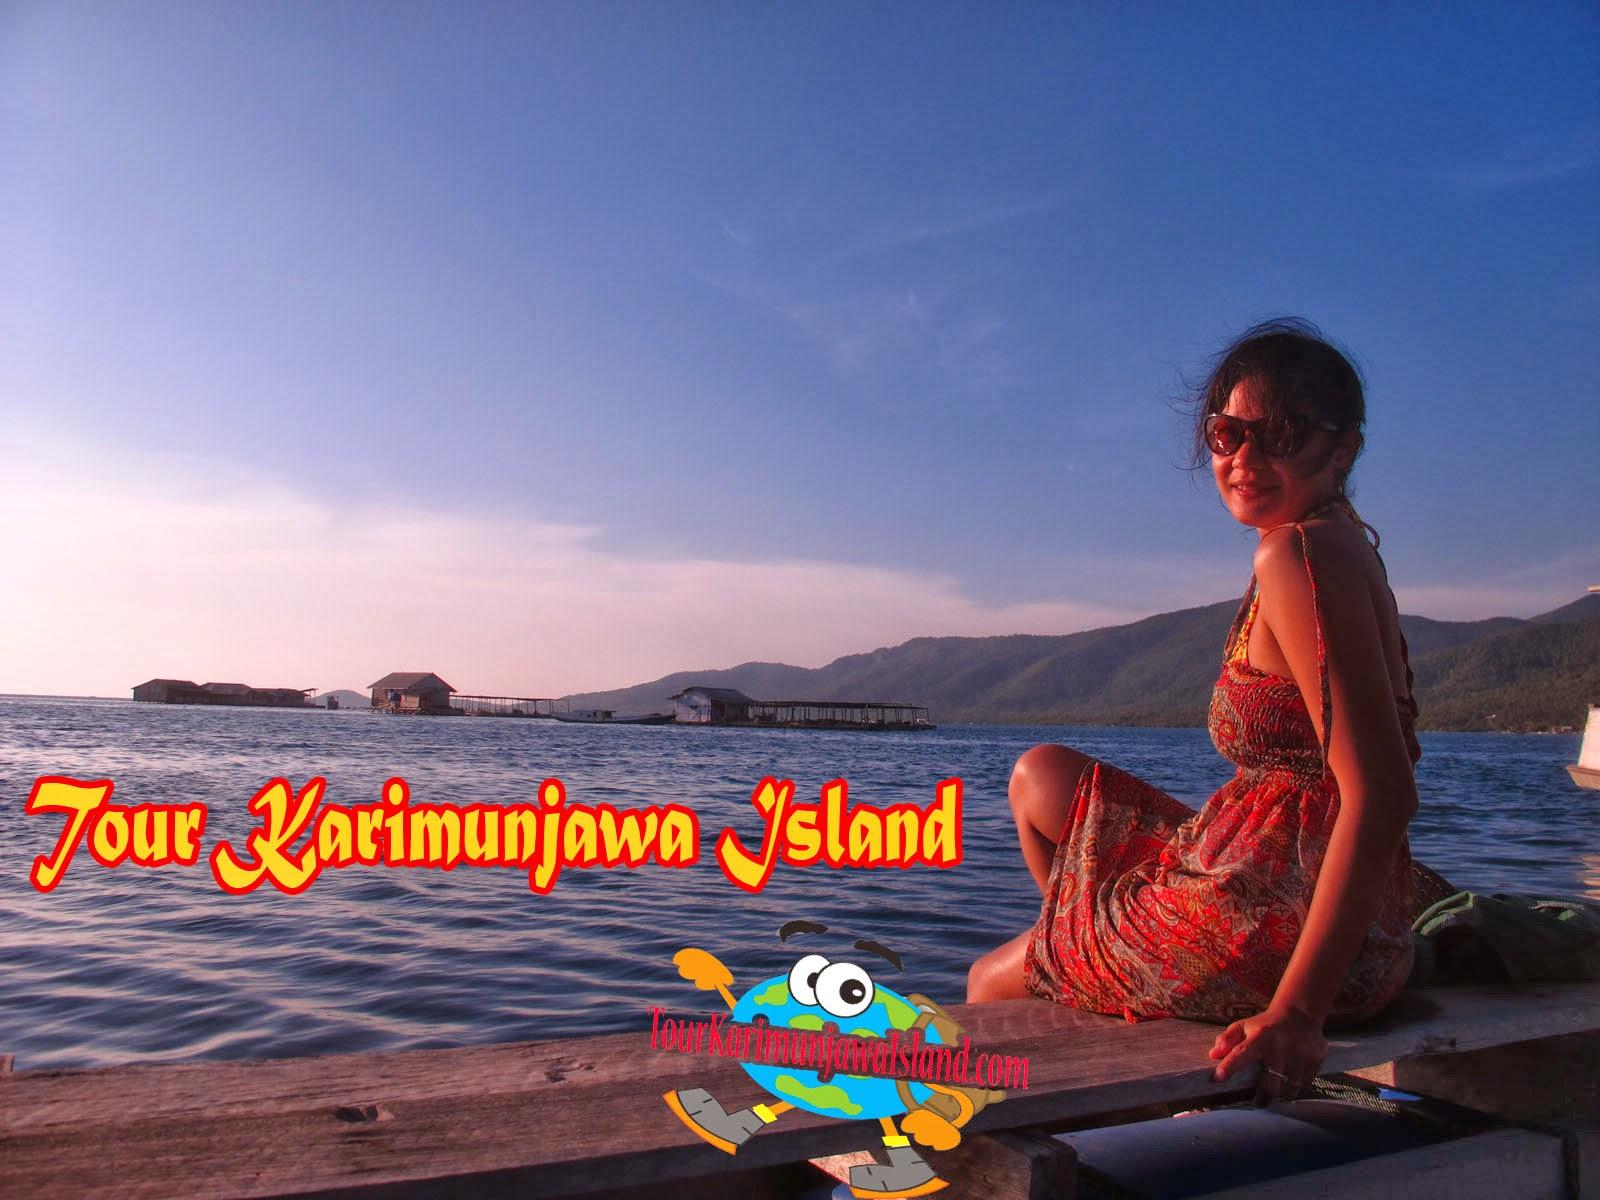 Pesona Karimunjawa, dari laut sampai pulau, Panorama karimunjawa, pantai karimunjawa, pulau karimun jawa, bawah laut karimunjawa, indahnya karimunjawa, tour karimunjawa, paket wisata karimunjawa, trip karimunjawa